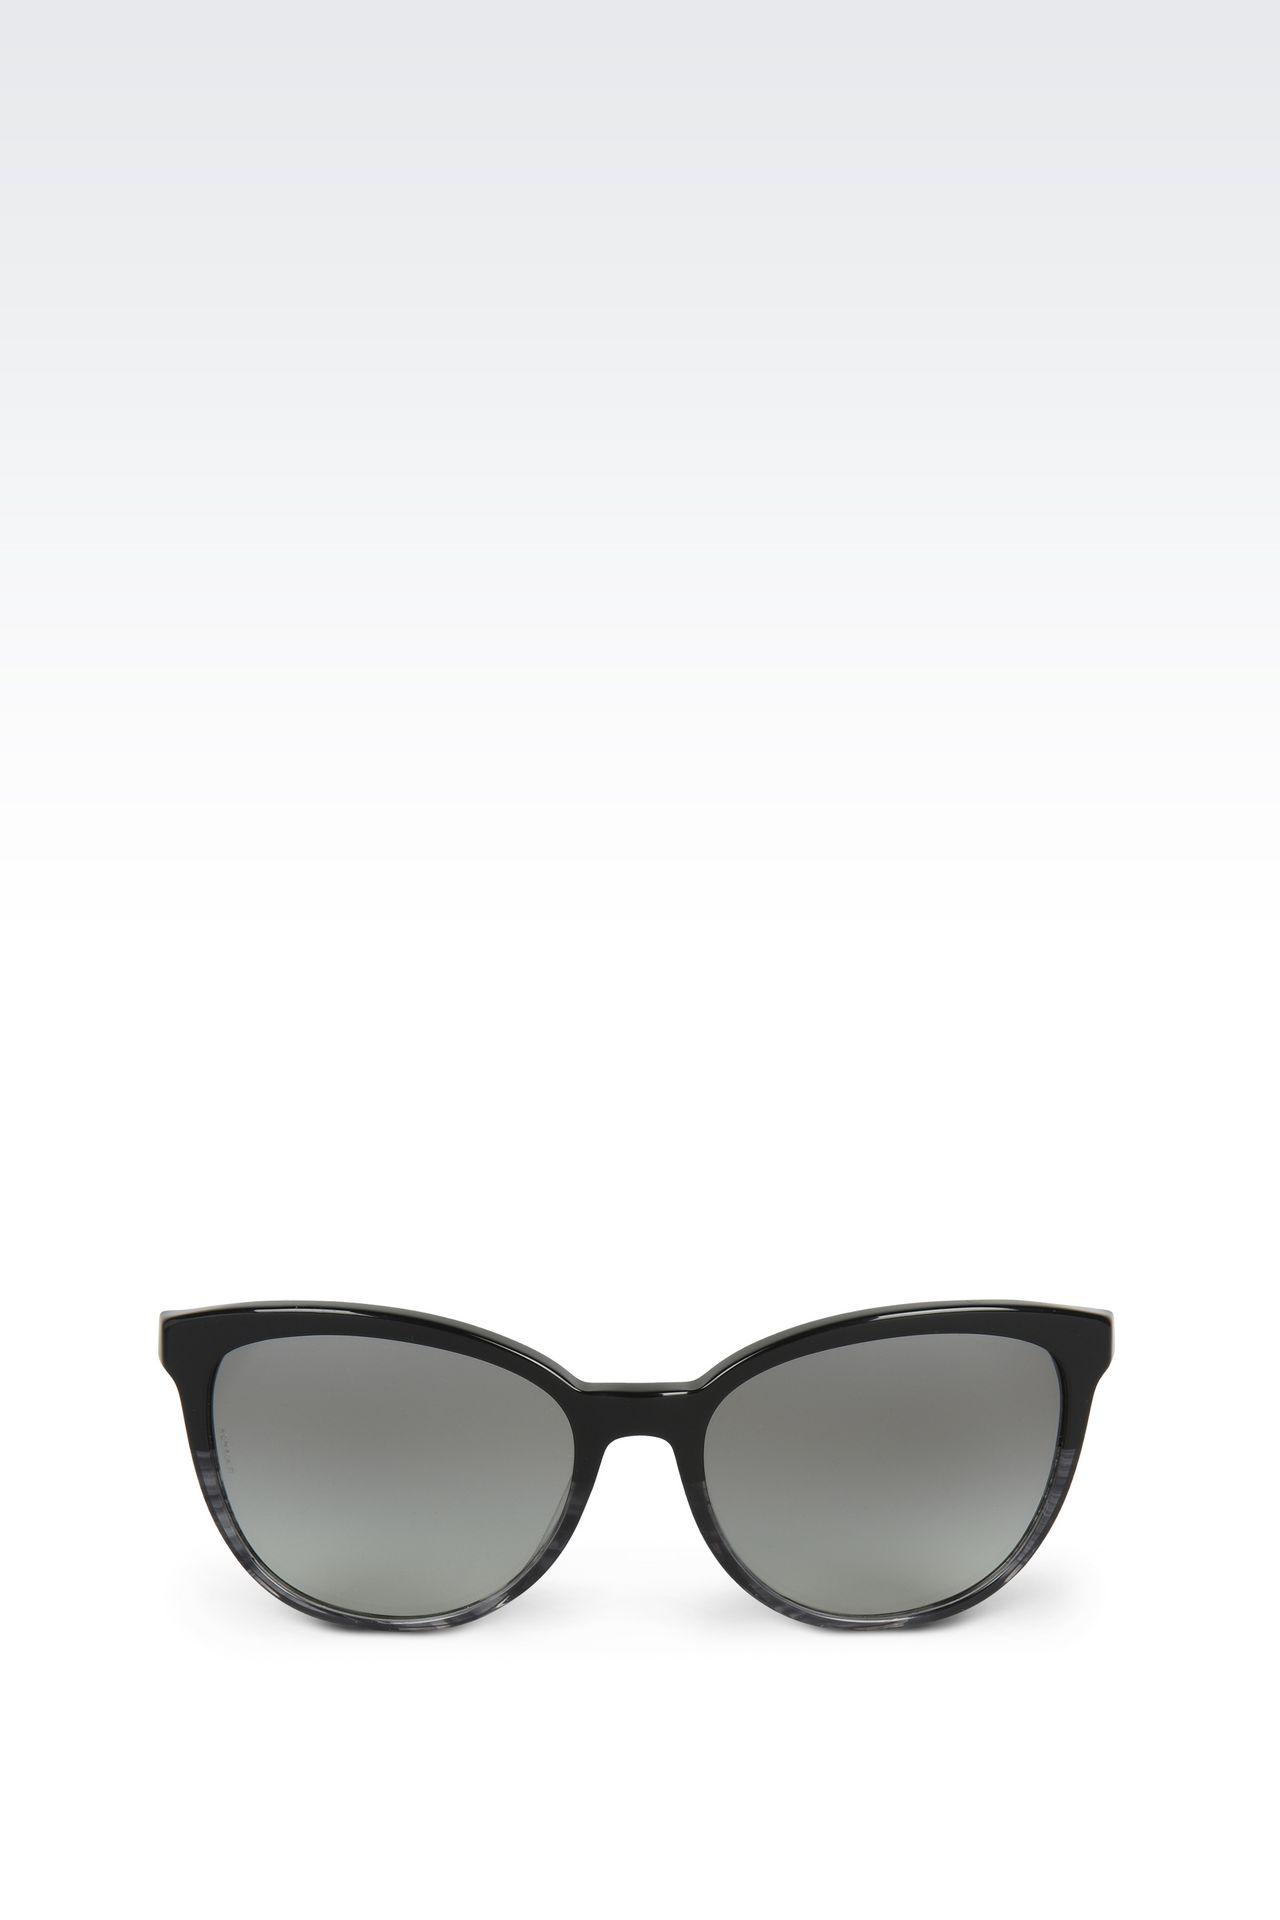 Sunglasses: Sunglasses Women by Armani - 0